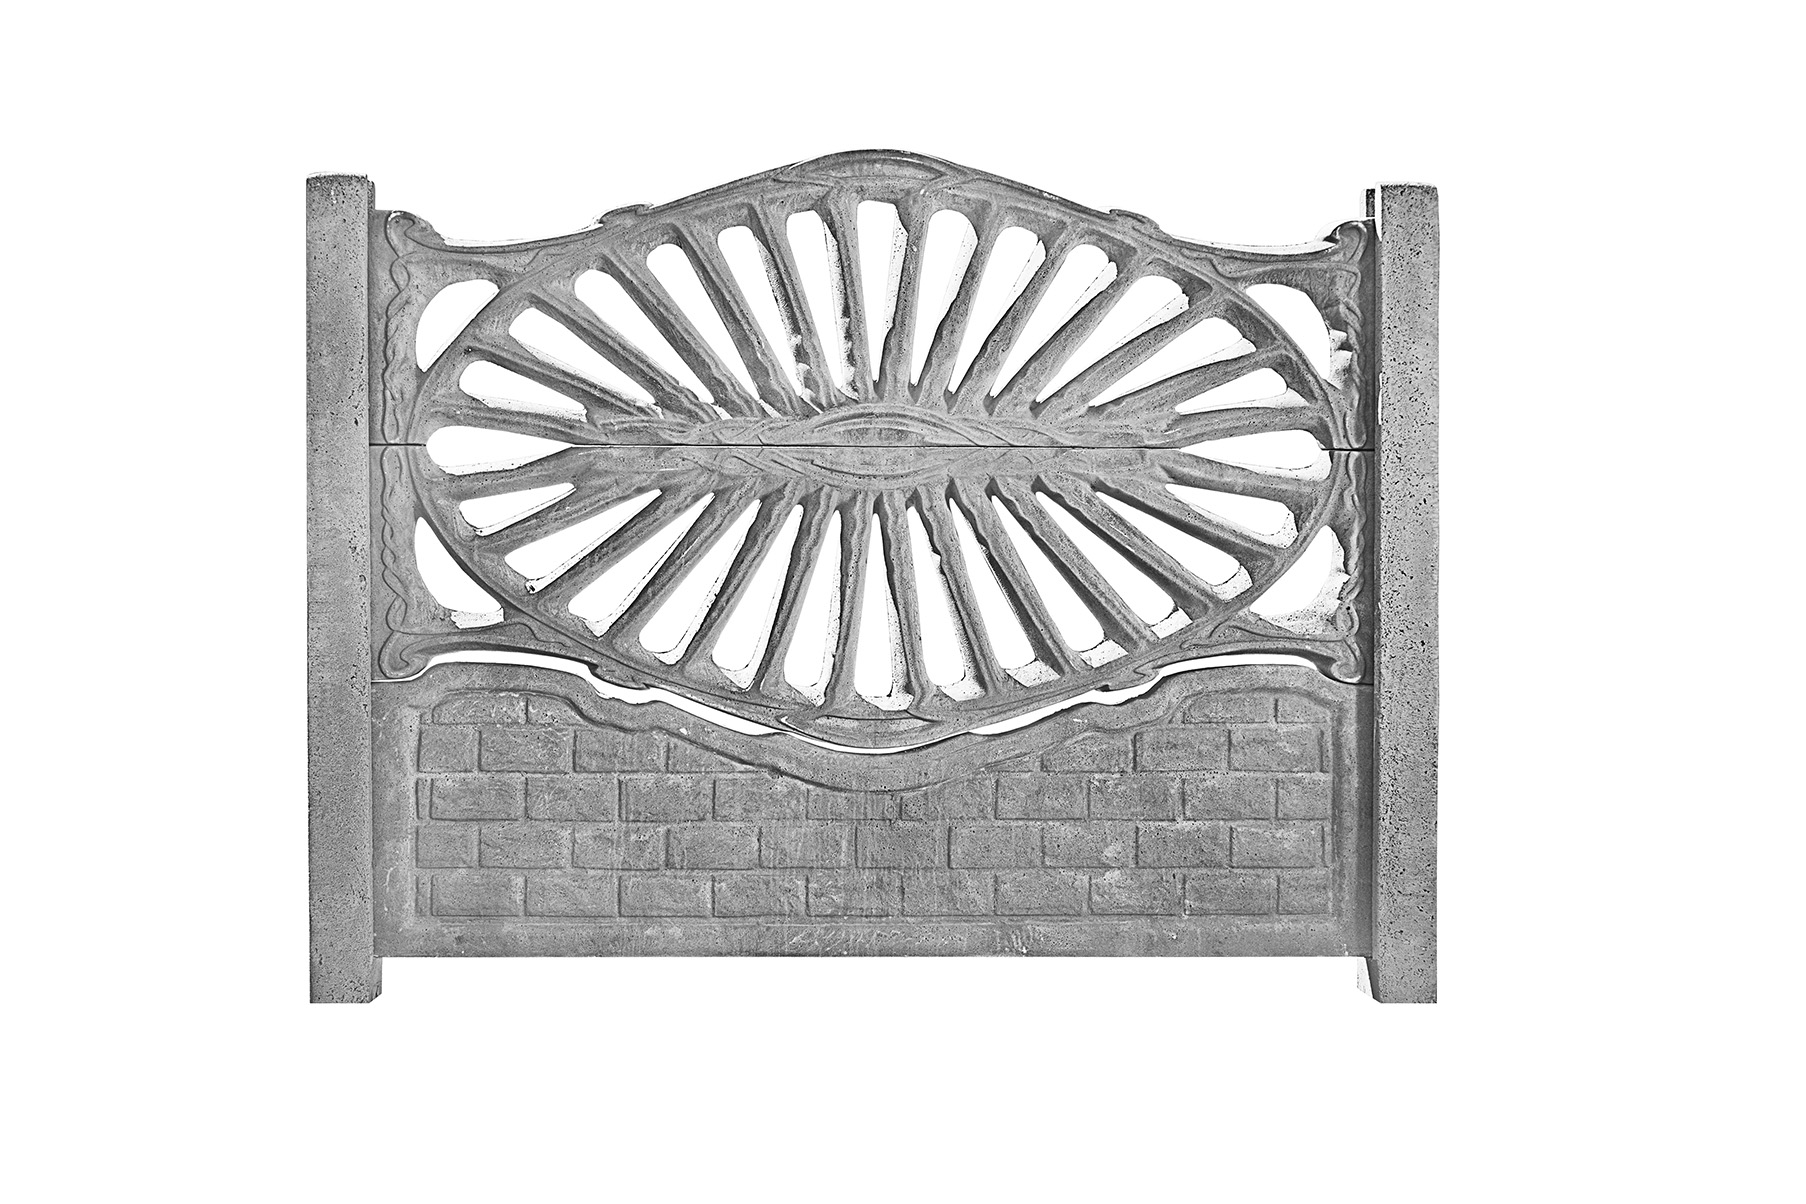 betónové ploty číslo modelu 20